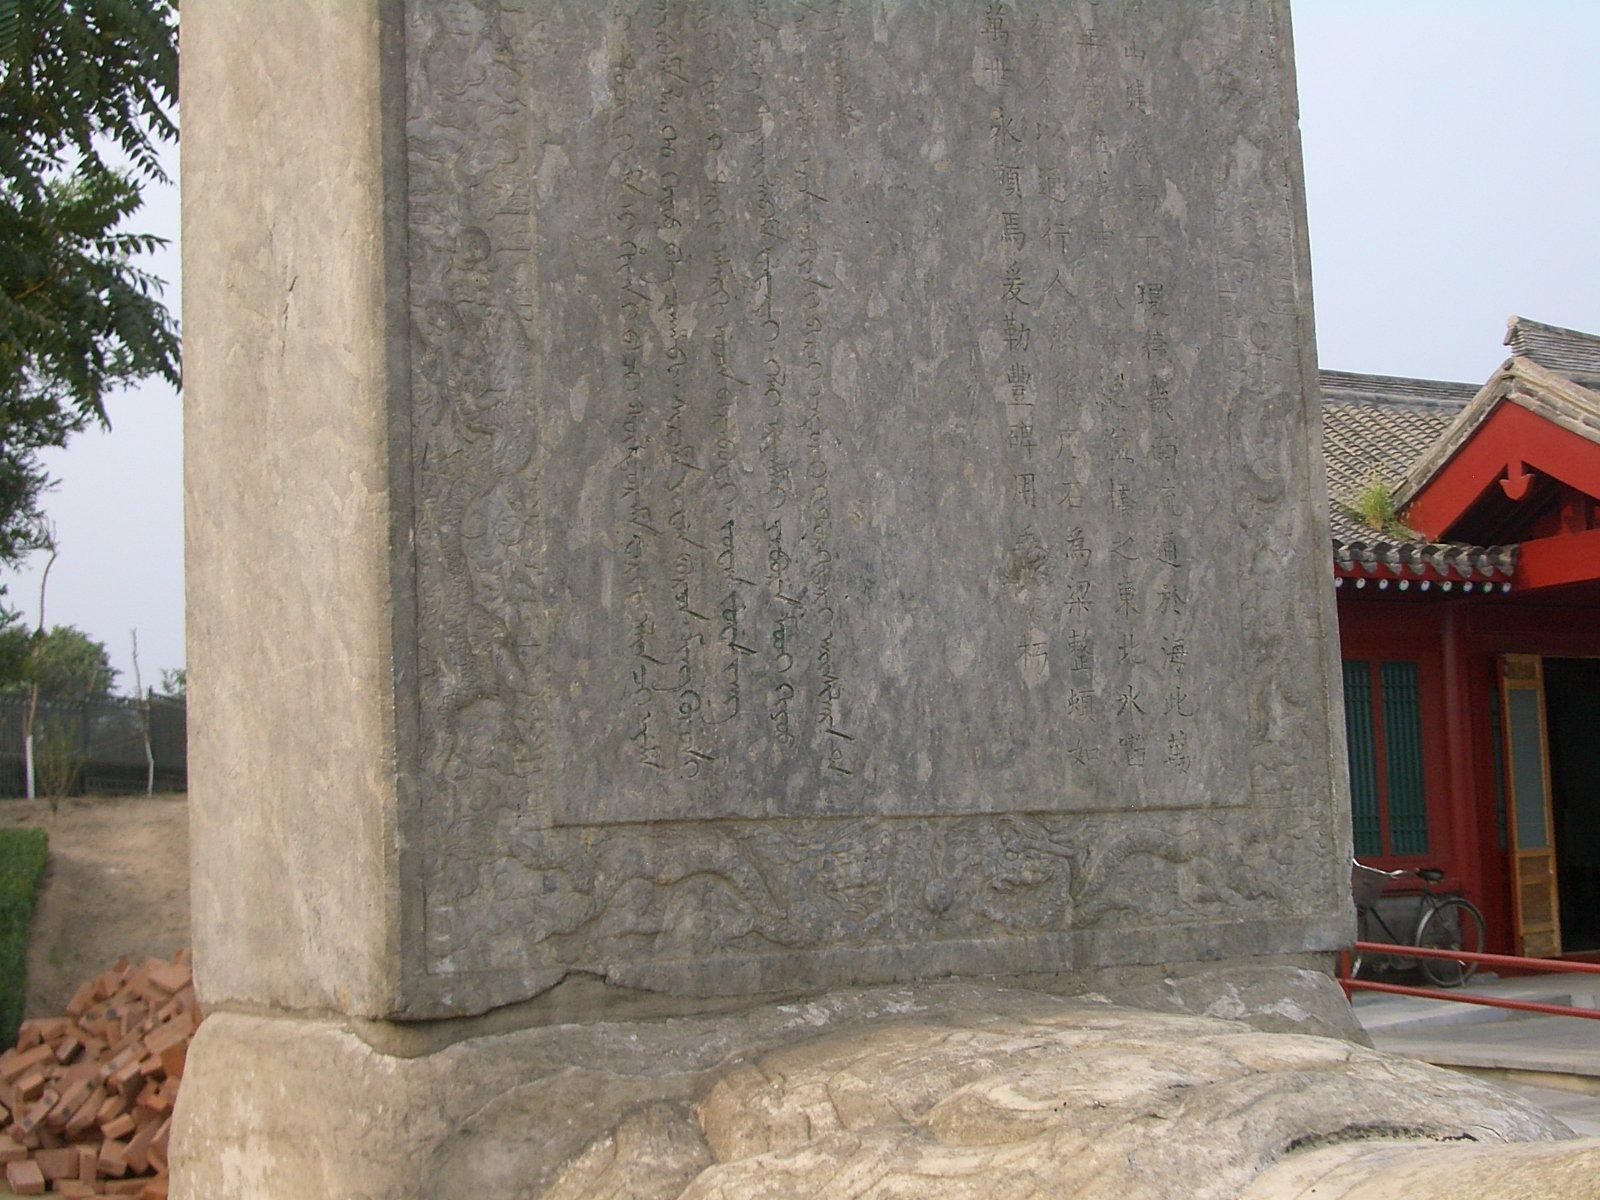 Photo of Kangxi Emperor stele by Vmenkov